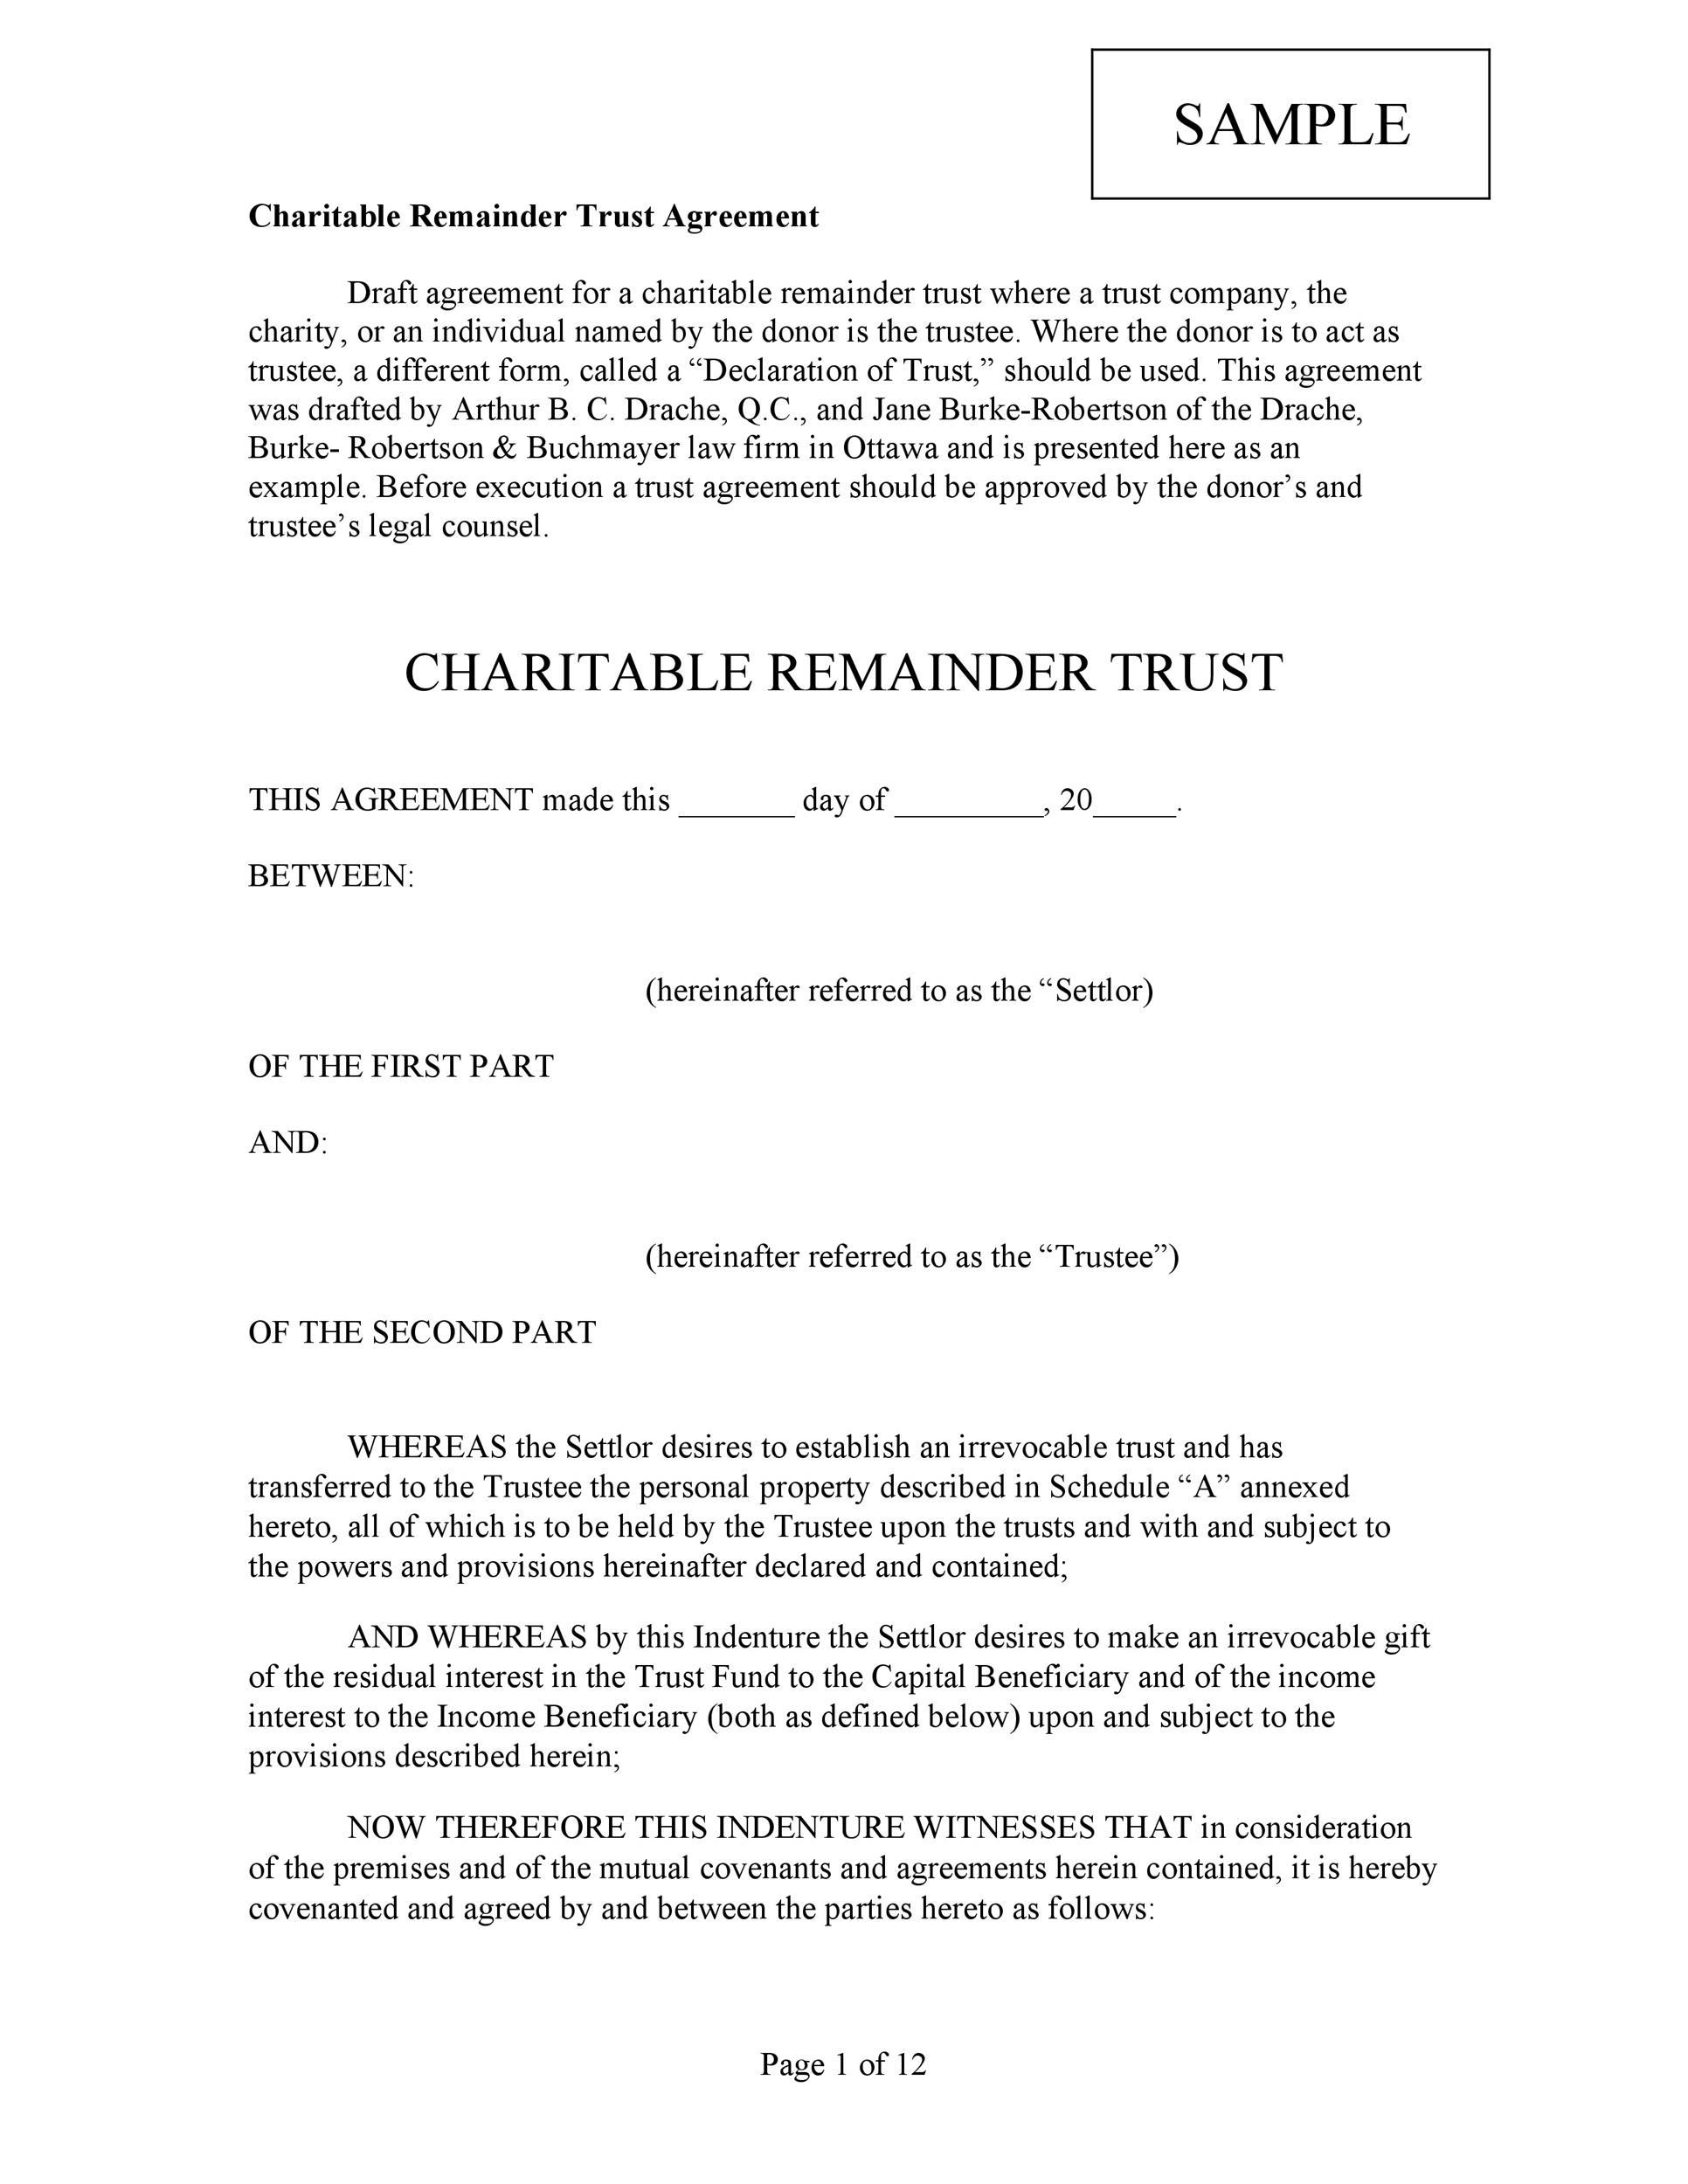 Free trust agreement 09